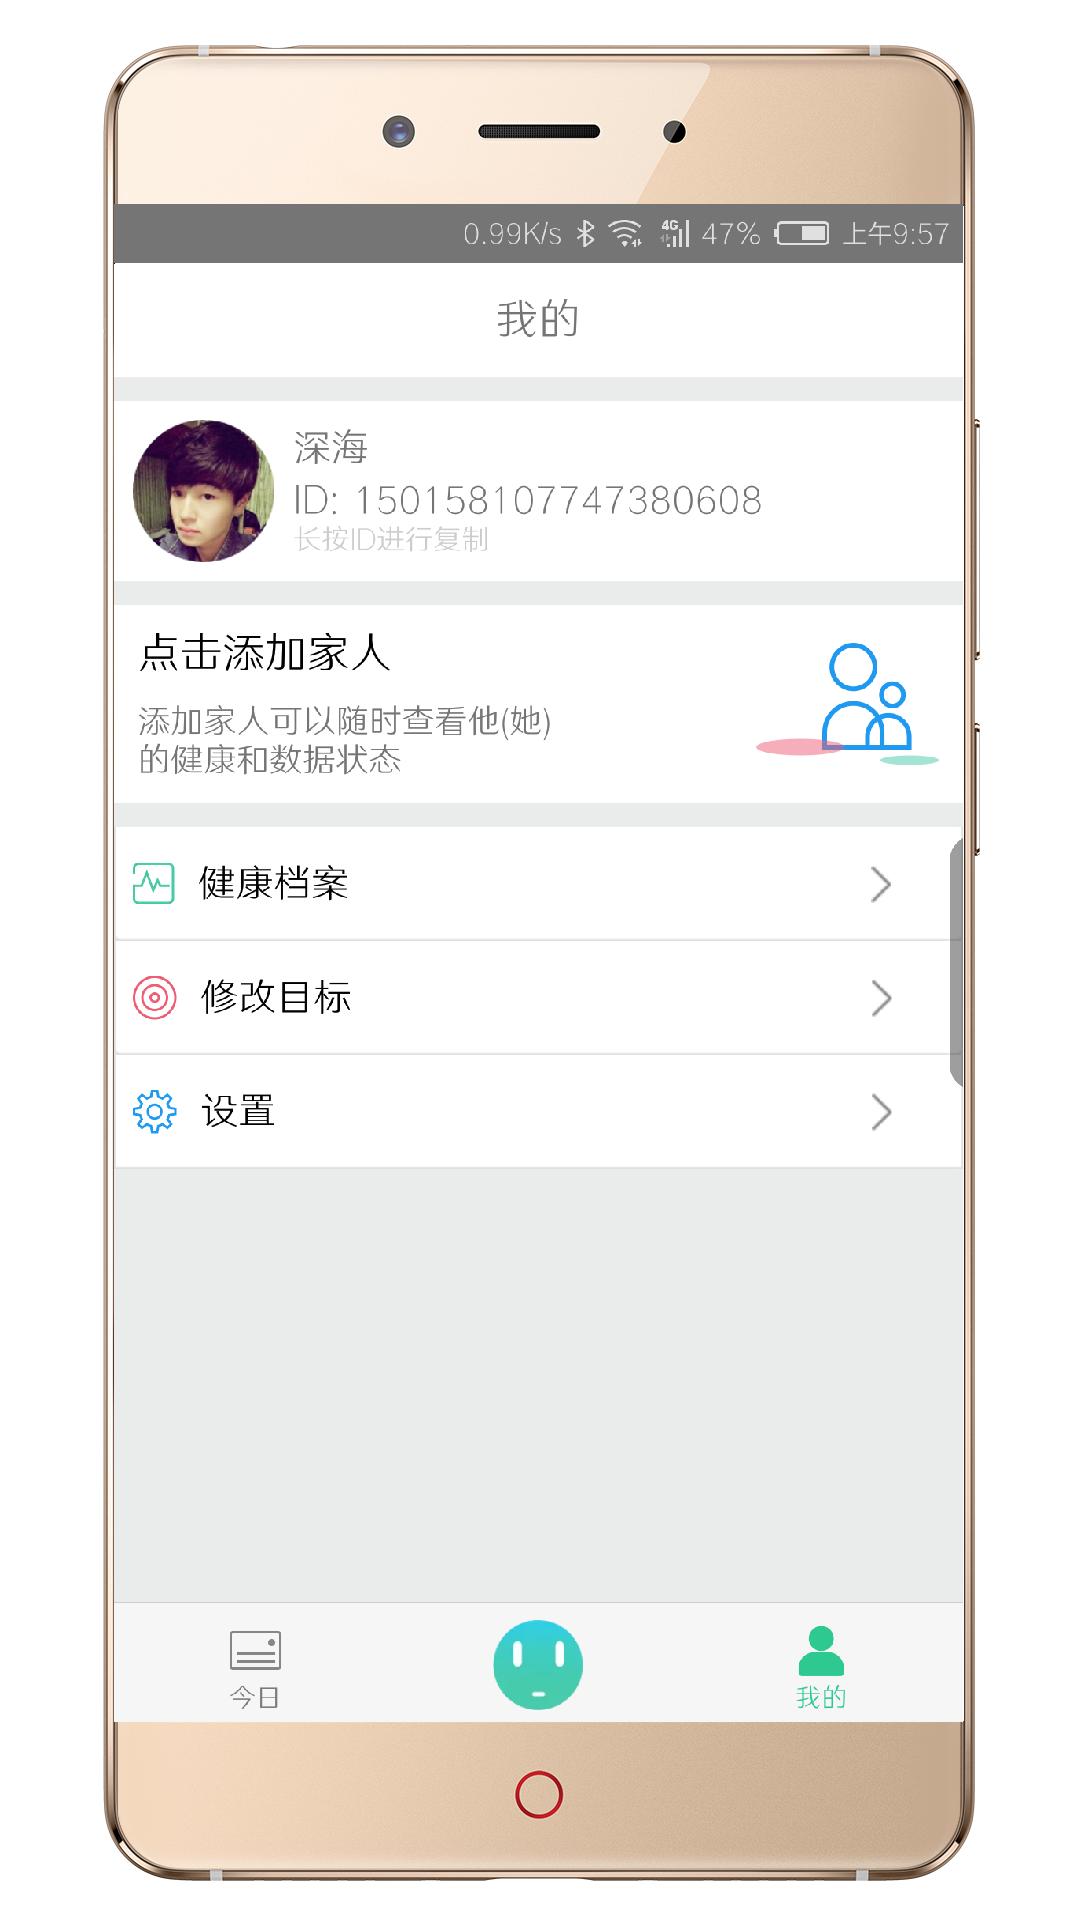 Screenshot_2017-08-17-09-57-23.png